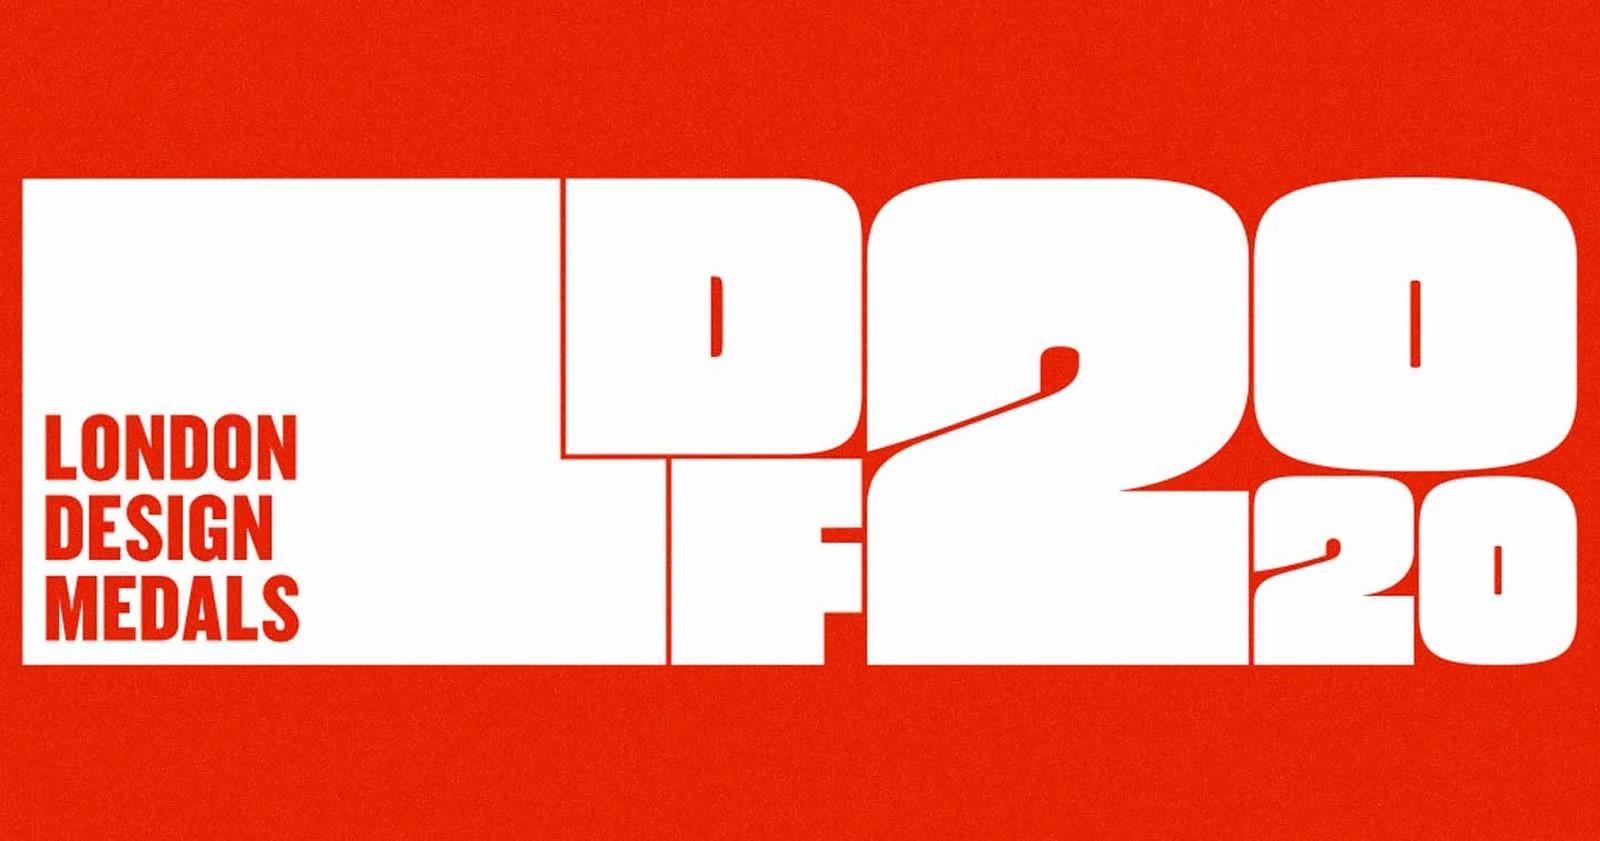 Winners of the 2020 London Design Medals announced- Paola Antonelli, Ken Garland, Ellen MacArthur and Yinka Ilori - Sheet1